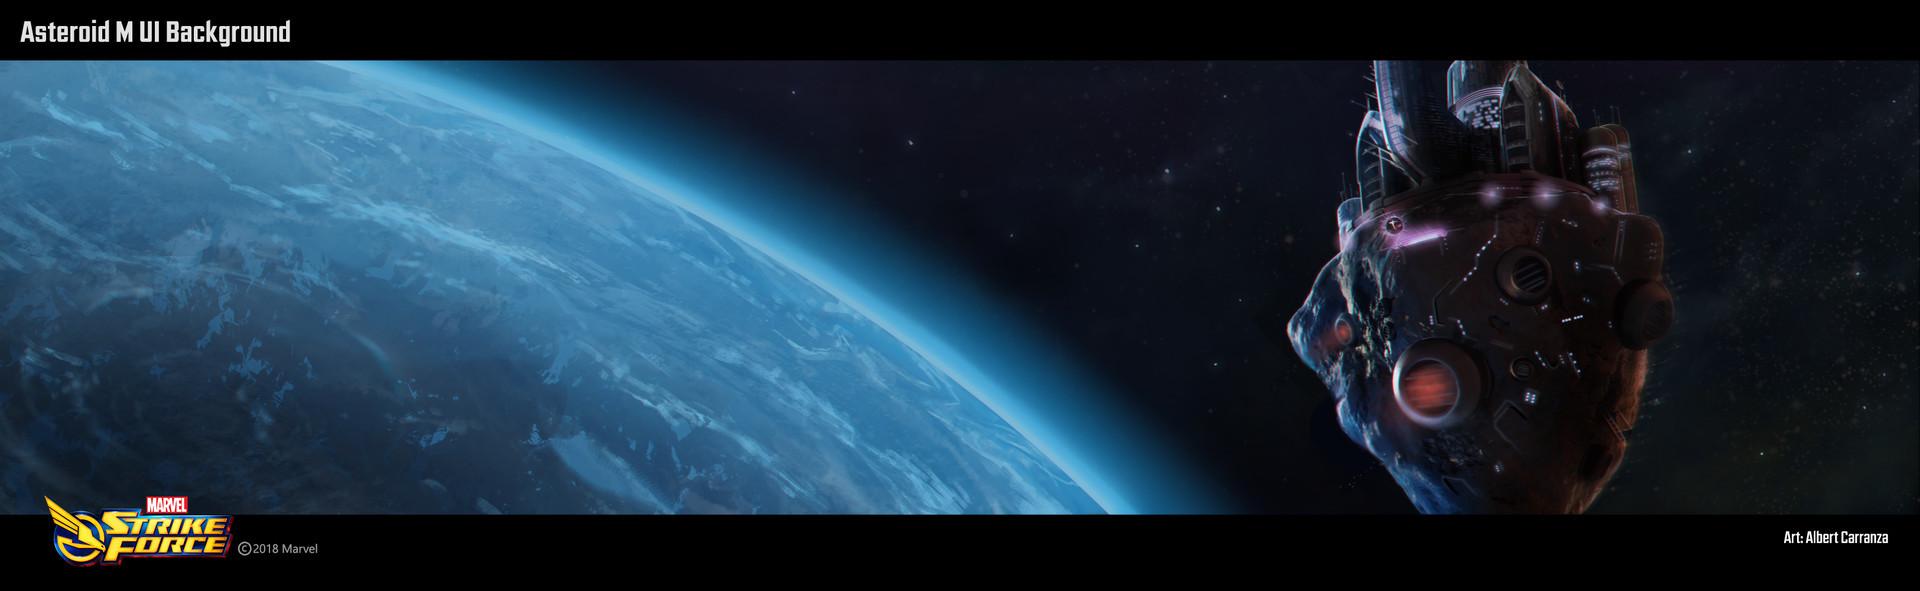 Albert carranza albert carranza ui homebackground asteroidm exp2 1mockup